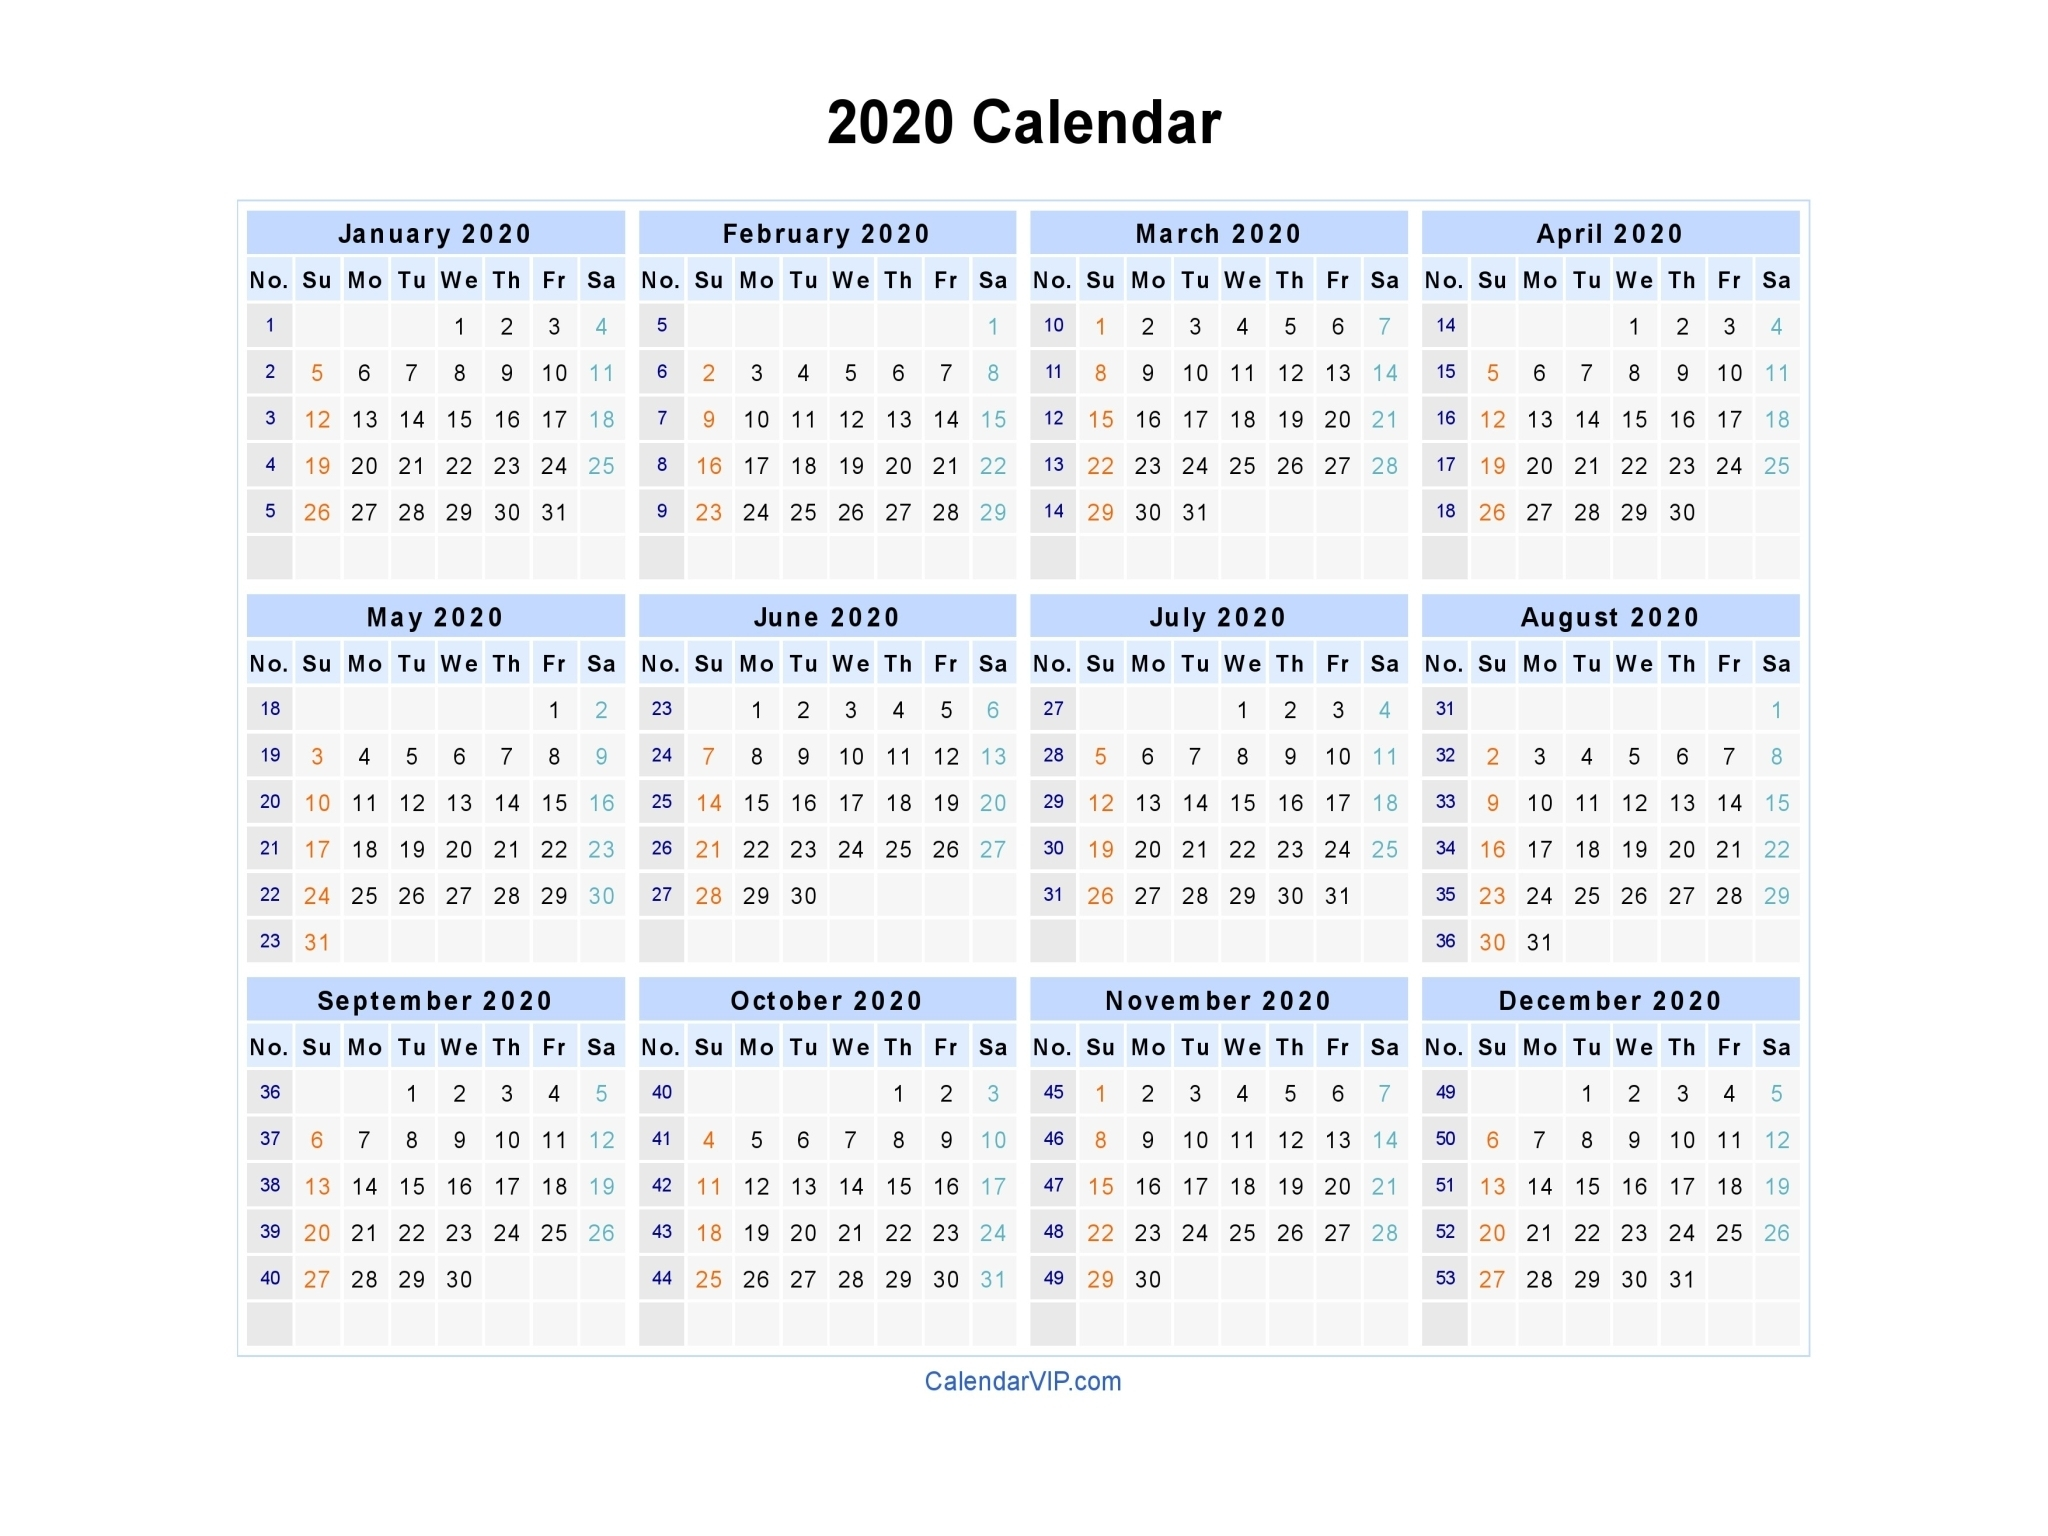 2020 Calendar - Blank Printable Calendar Template In Pdf Word Excel regarding 4-4-5 Calendar 2020